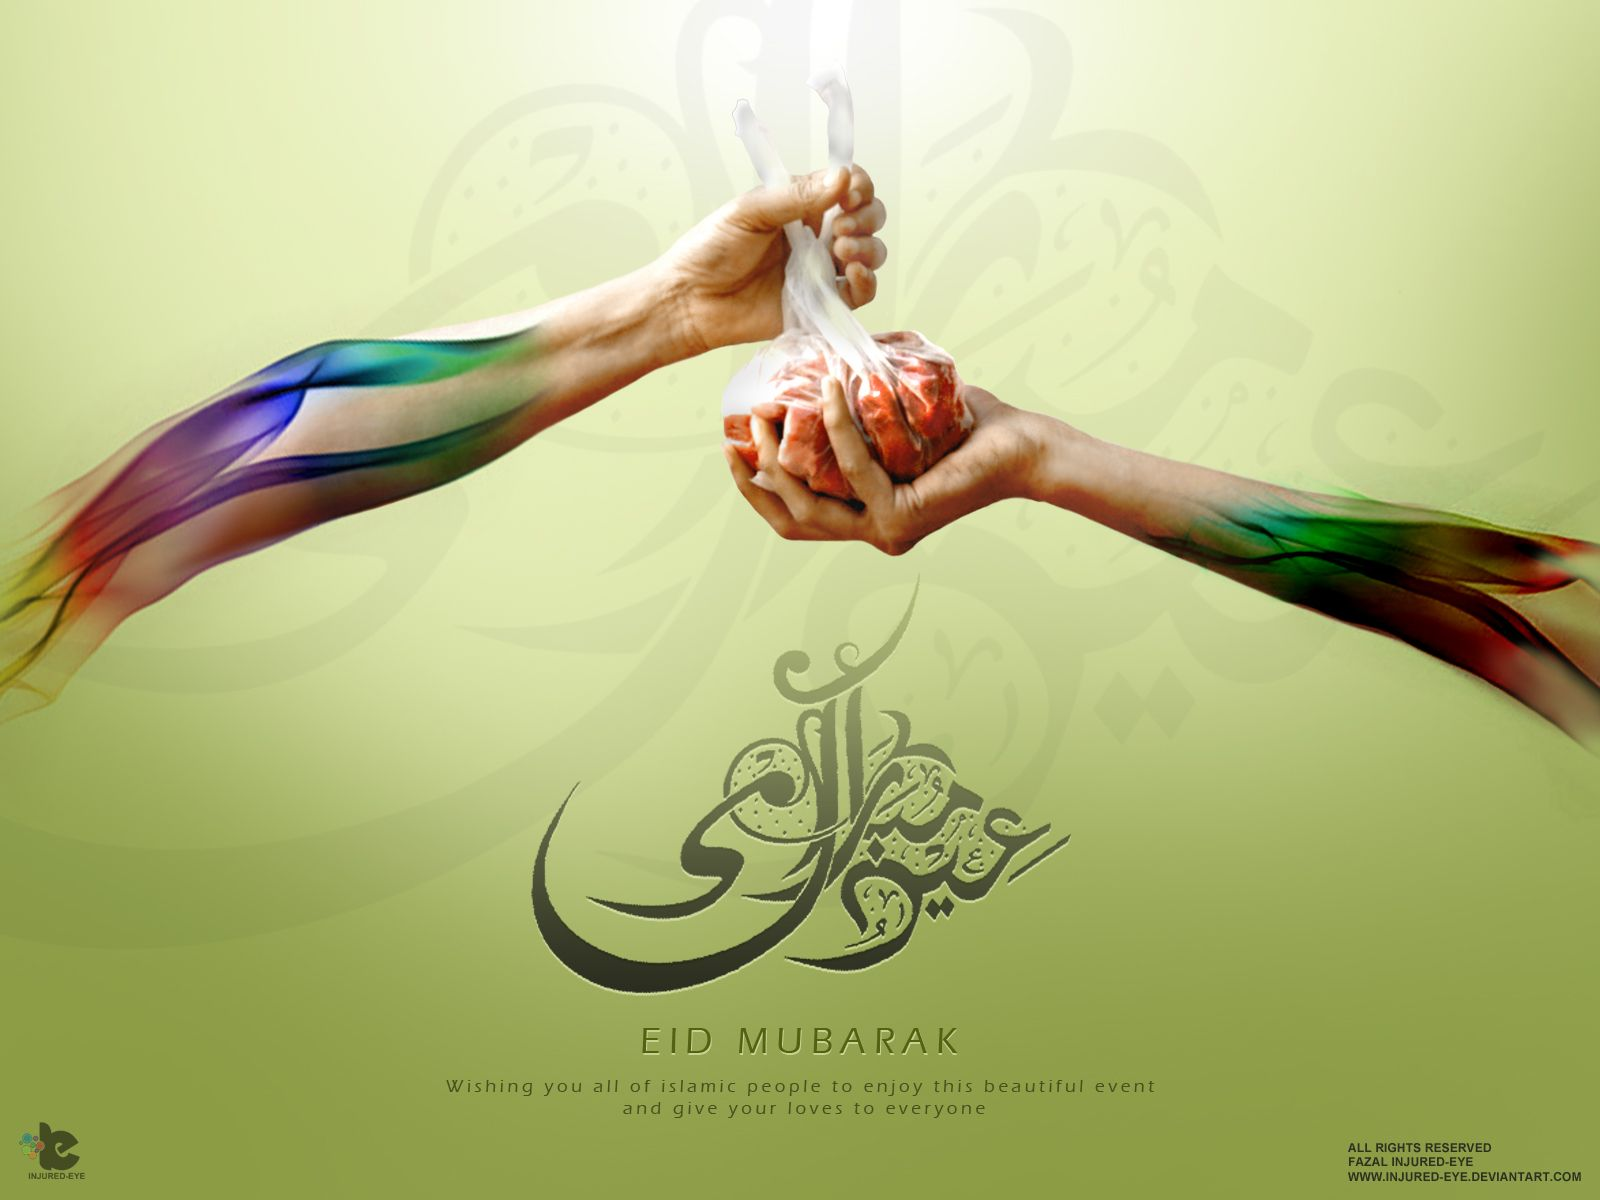 Wonderful Hijri Eid Al-Fitr Greeting - fda332089edf7c8a7a7f0256a60181d9  Best Photo Reference_656012 .jpg